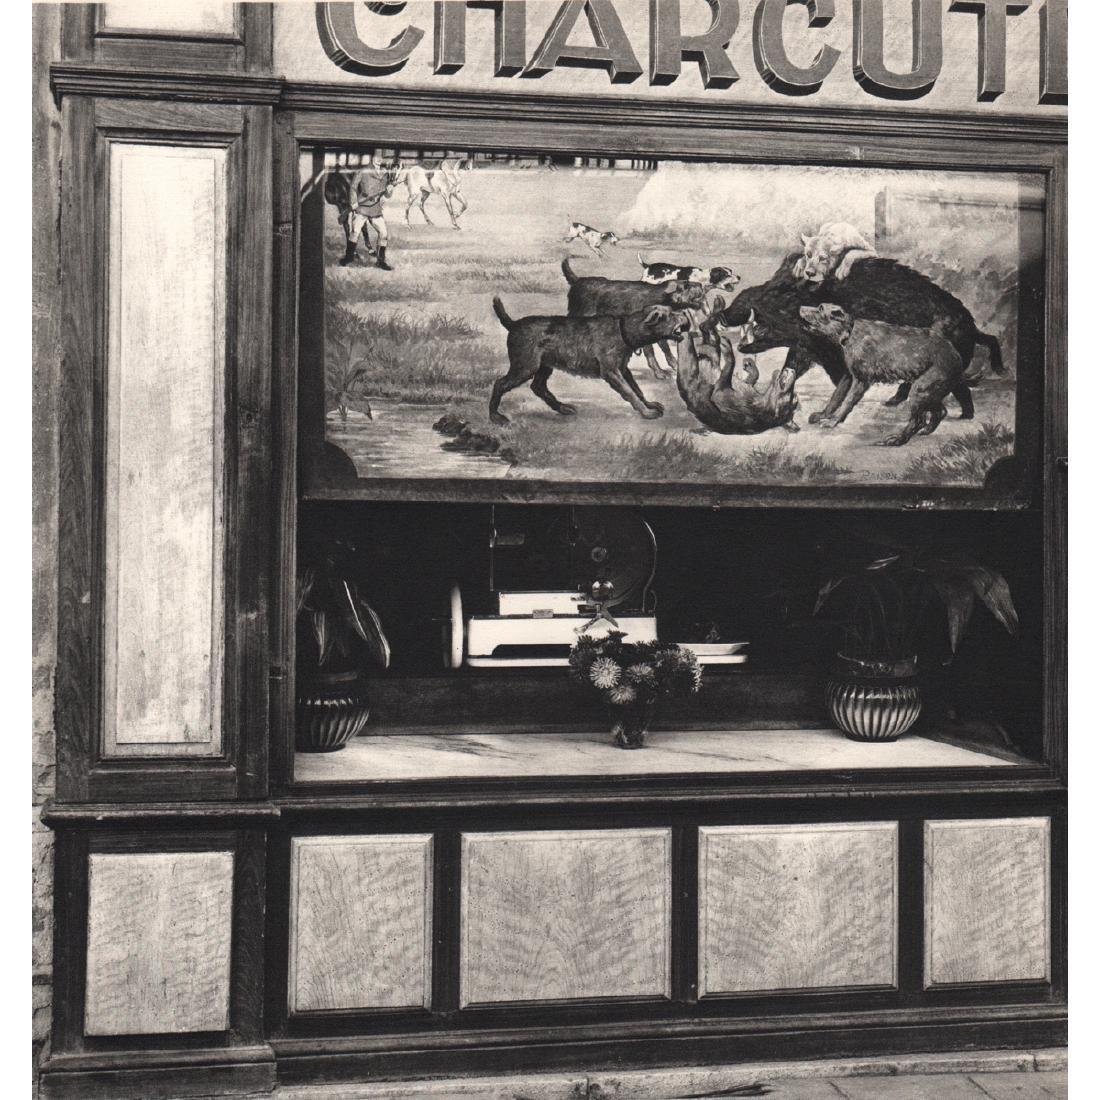 PAUL STRAND -  Charcuterie